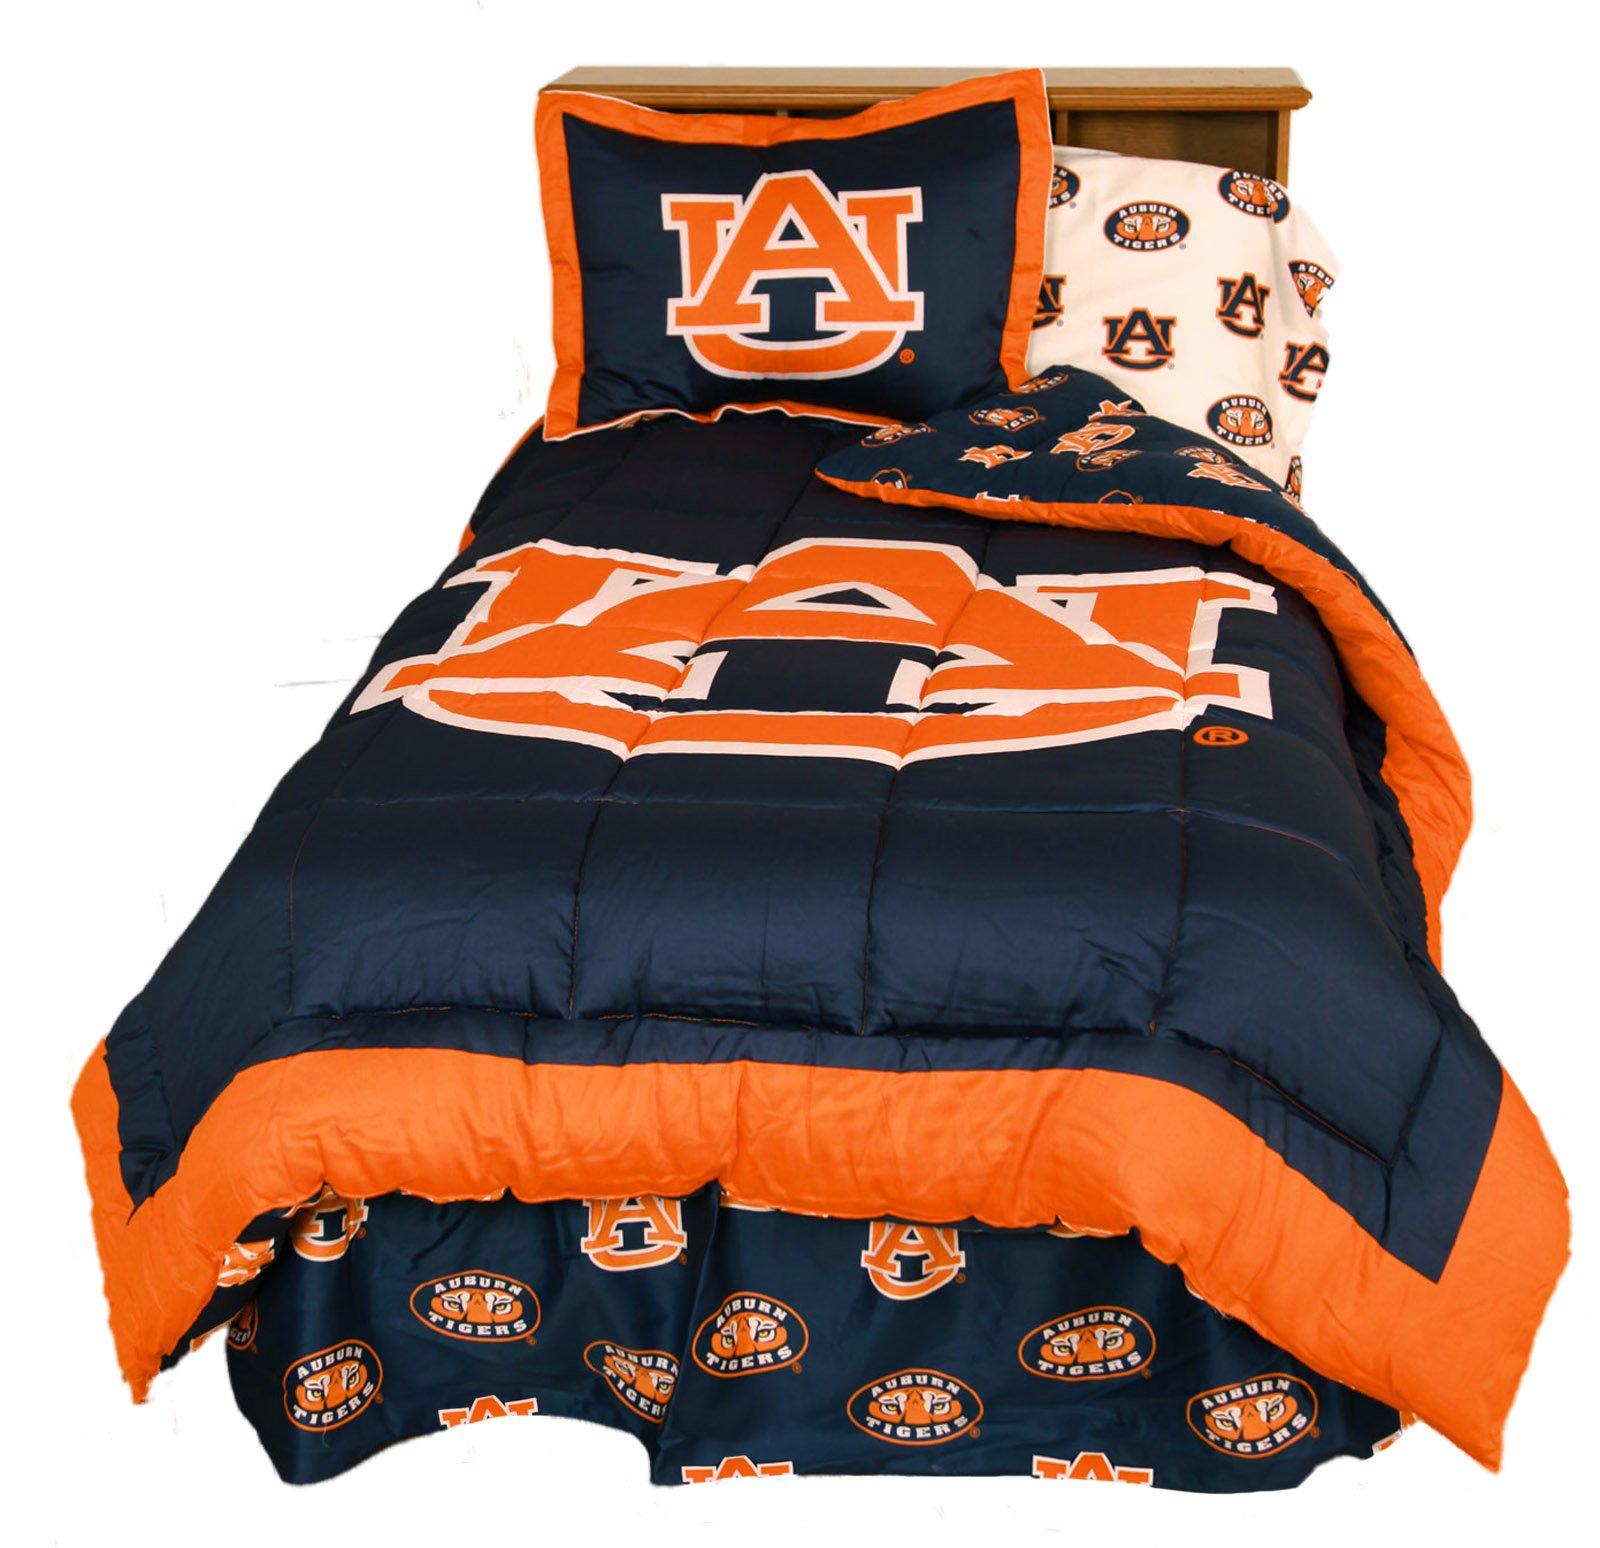 College Covers Auburn Tigers Reversible Comforter Set, King